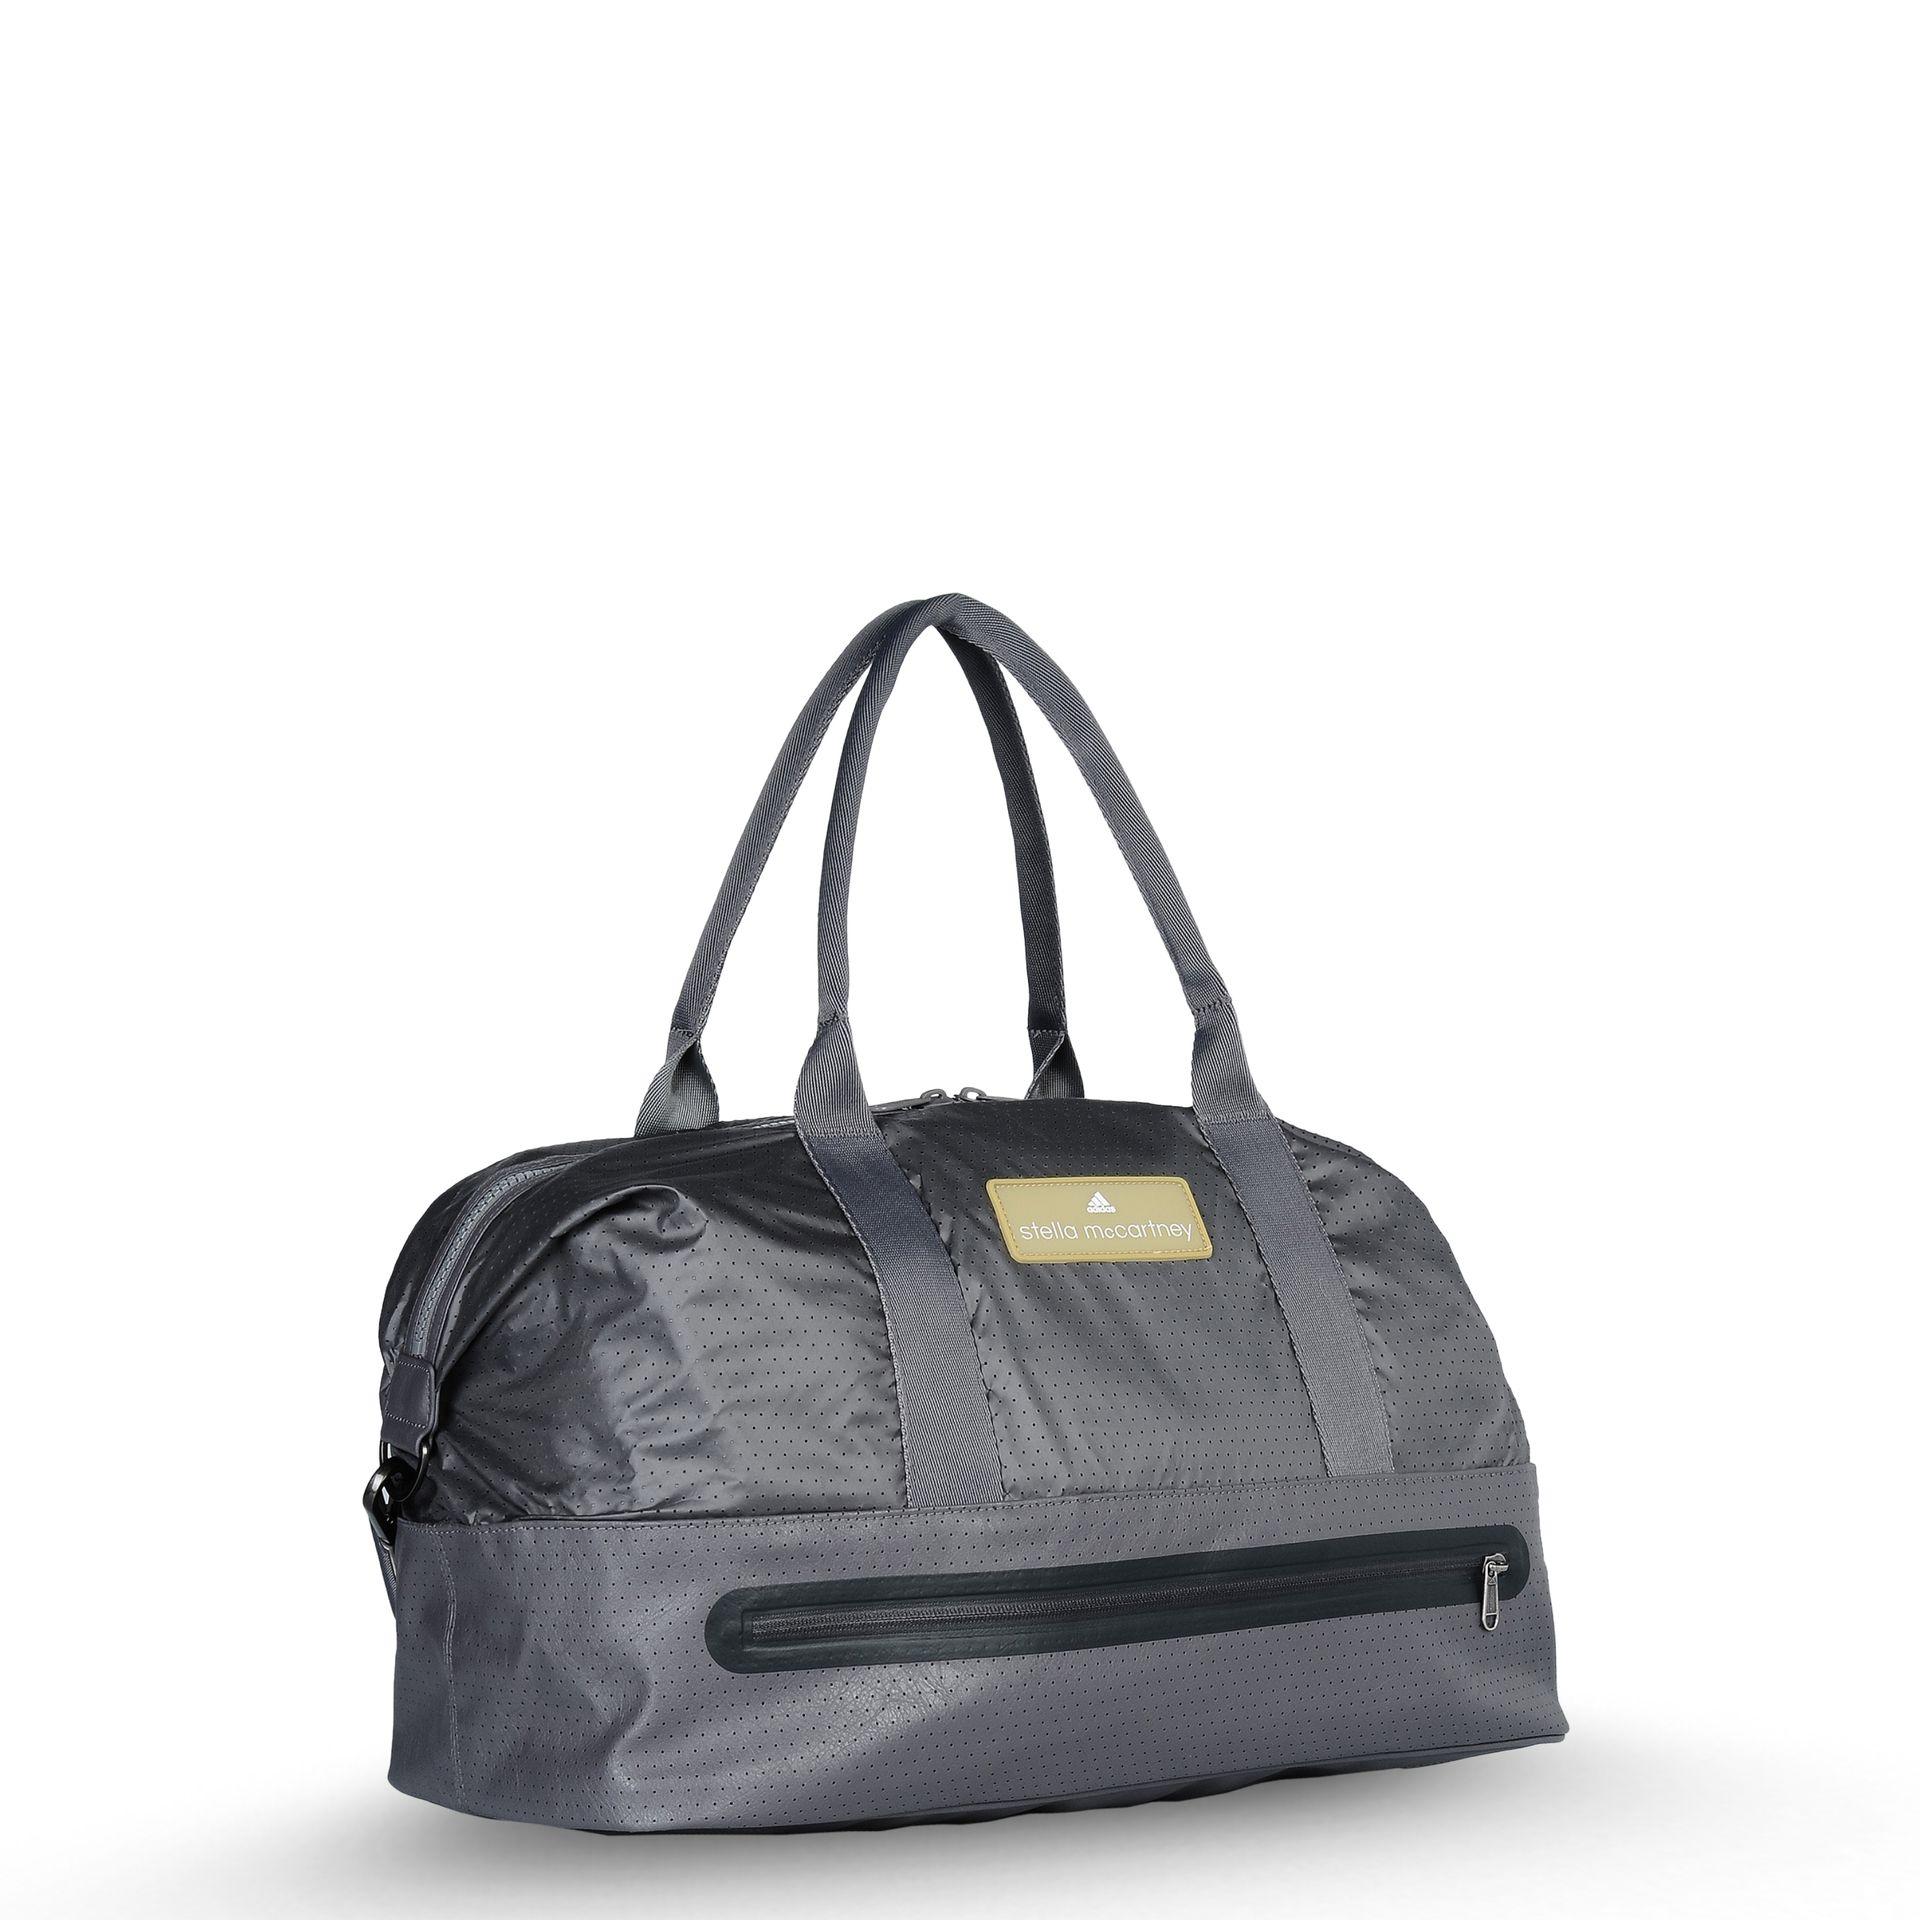 lyst stella mccartney big sports bag in gray. Black Bedroom Furniture Sets. Home Design Ideas